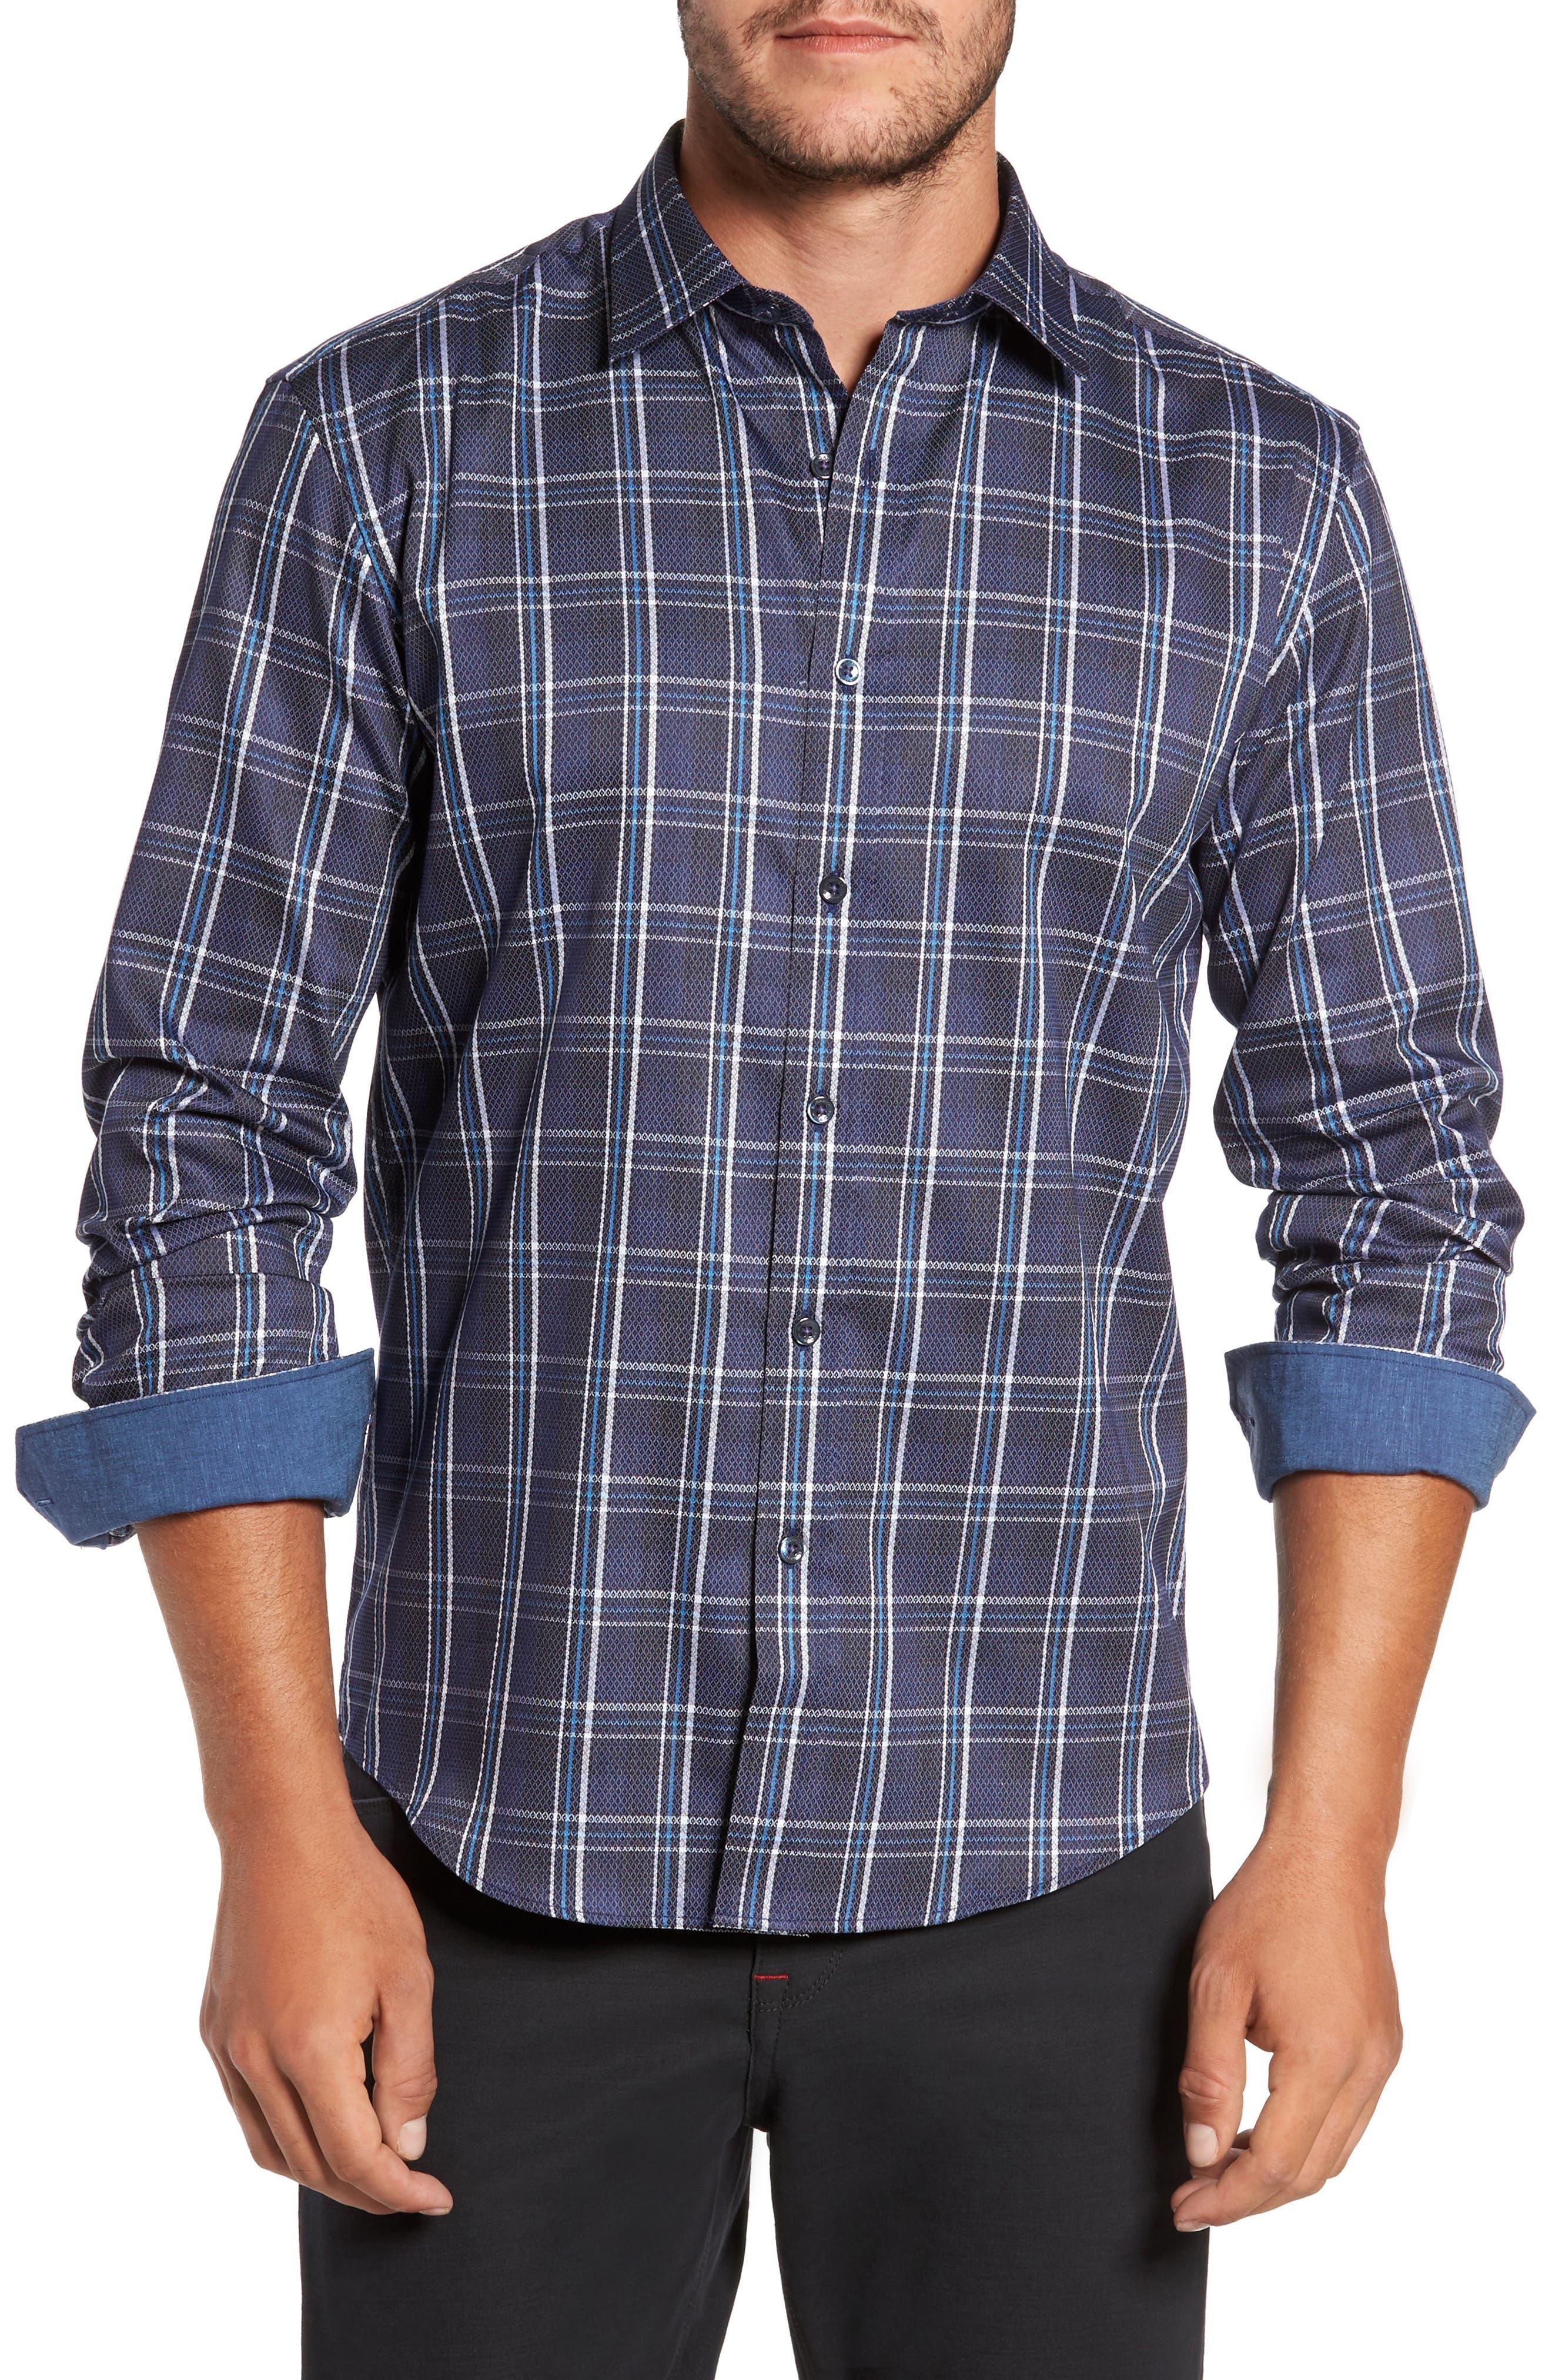 Alternate Image 1 Selected - Bugatchi Trim Fit Diamond Weave Windowpane Sport Shirt